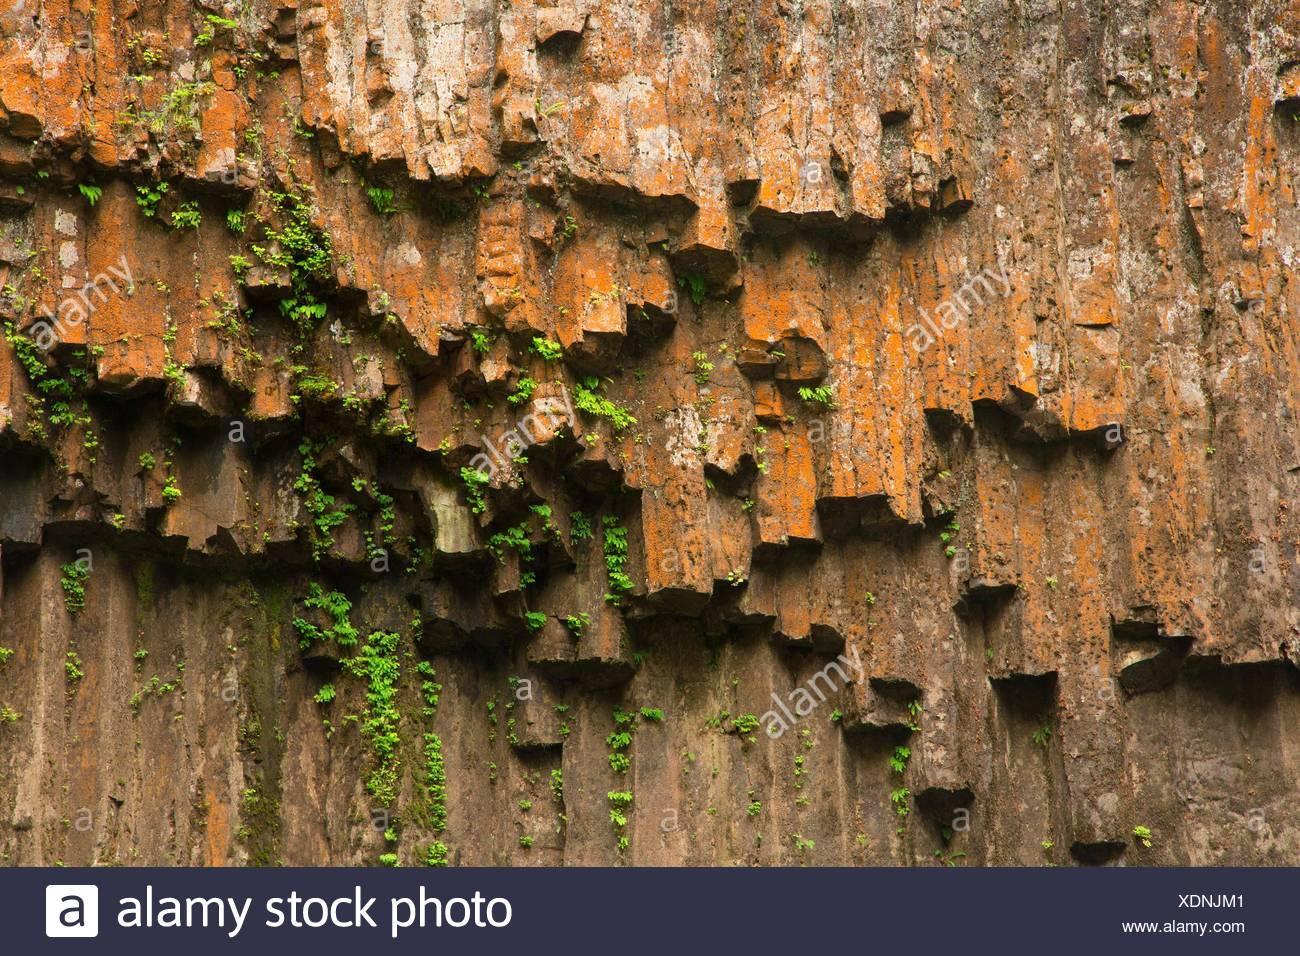 Columnar basalt at Abiqua Falls, Marion County, Oregon. - Stock Image